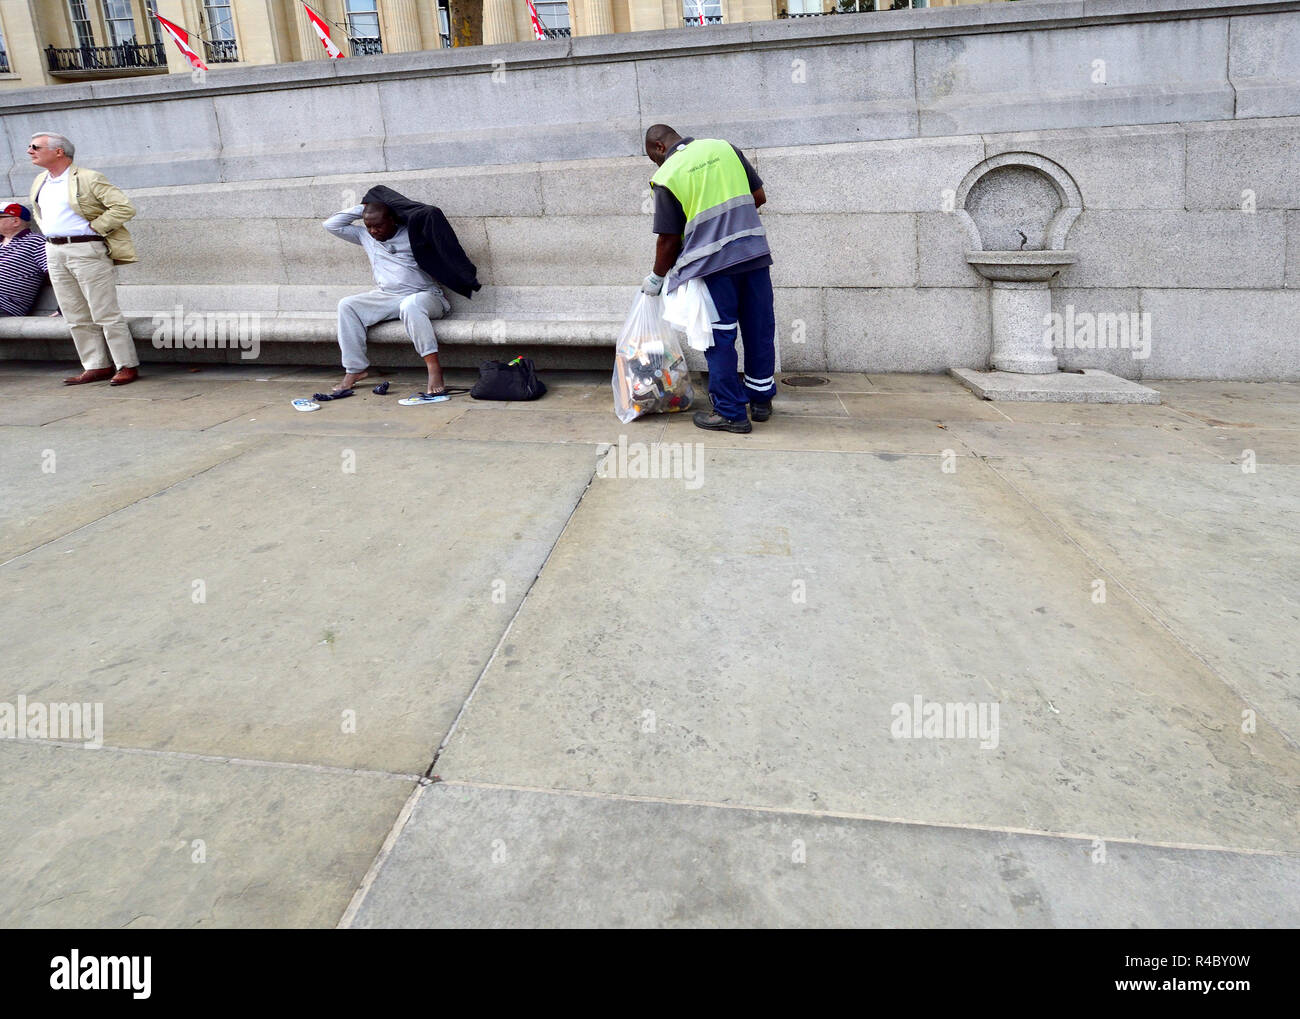 Cleaner picking up litter in Trafalgar Square, London, England, UK. Stock Photo